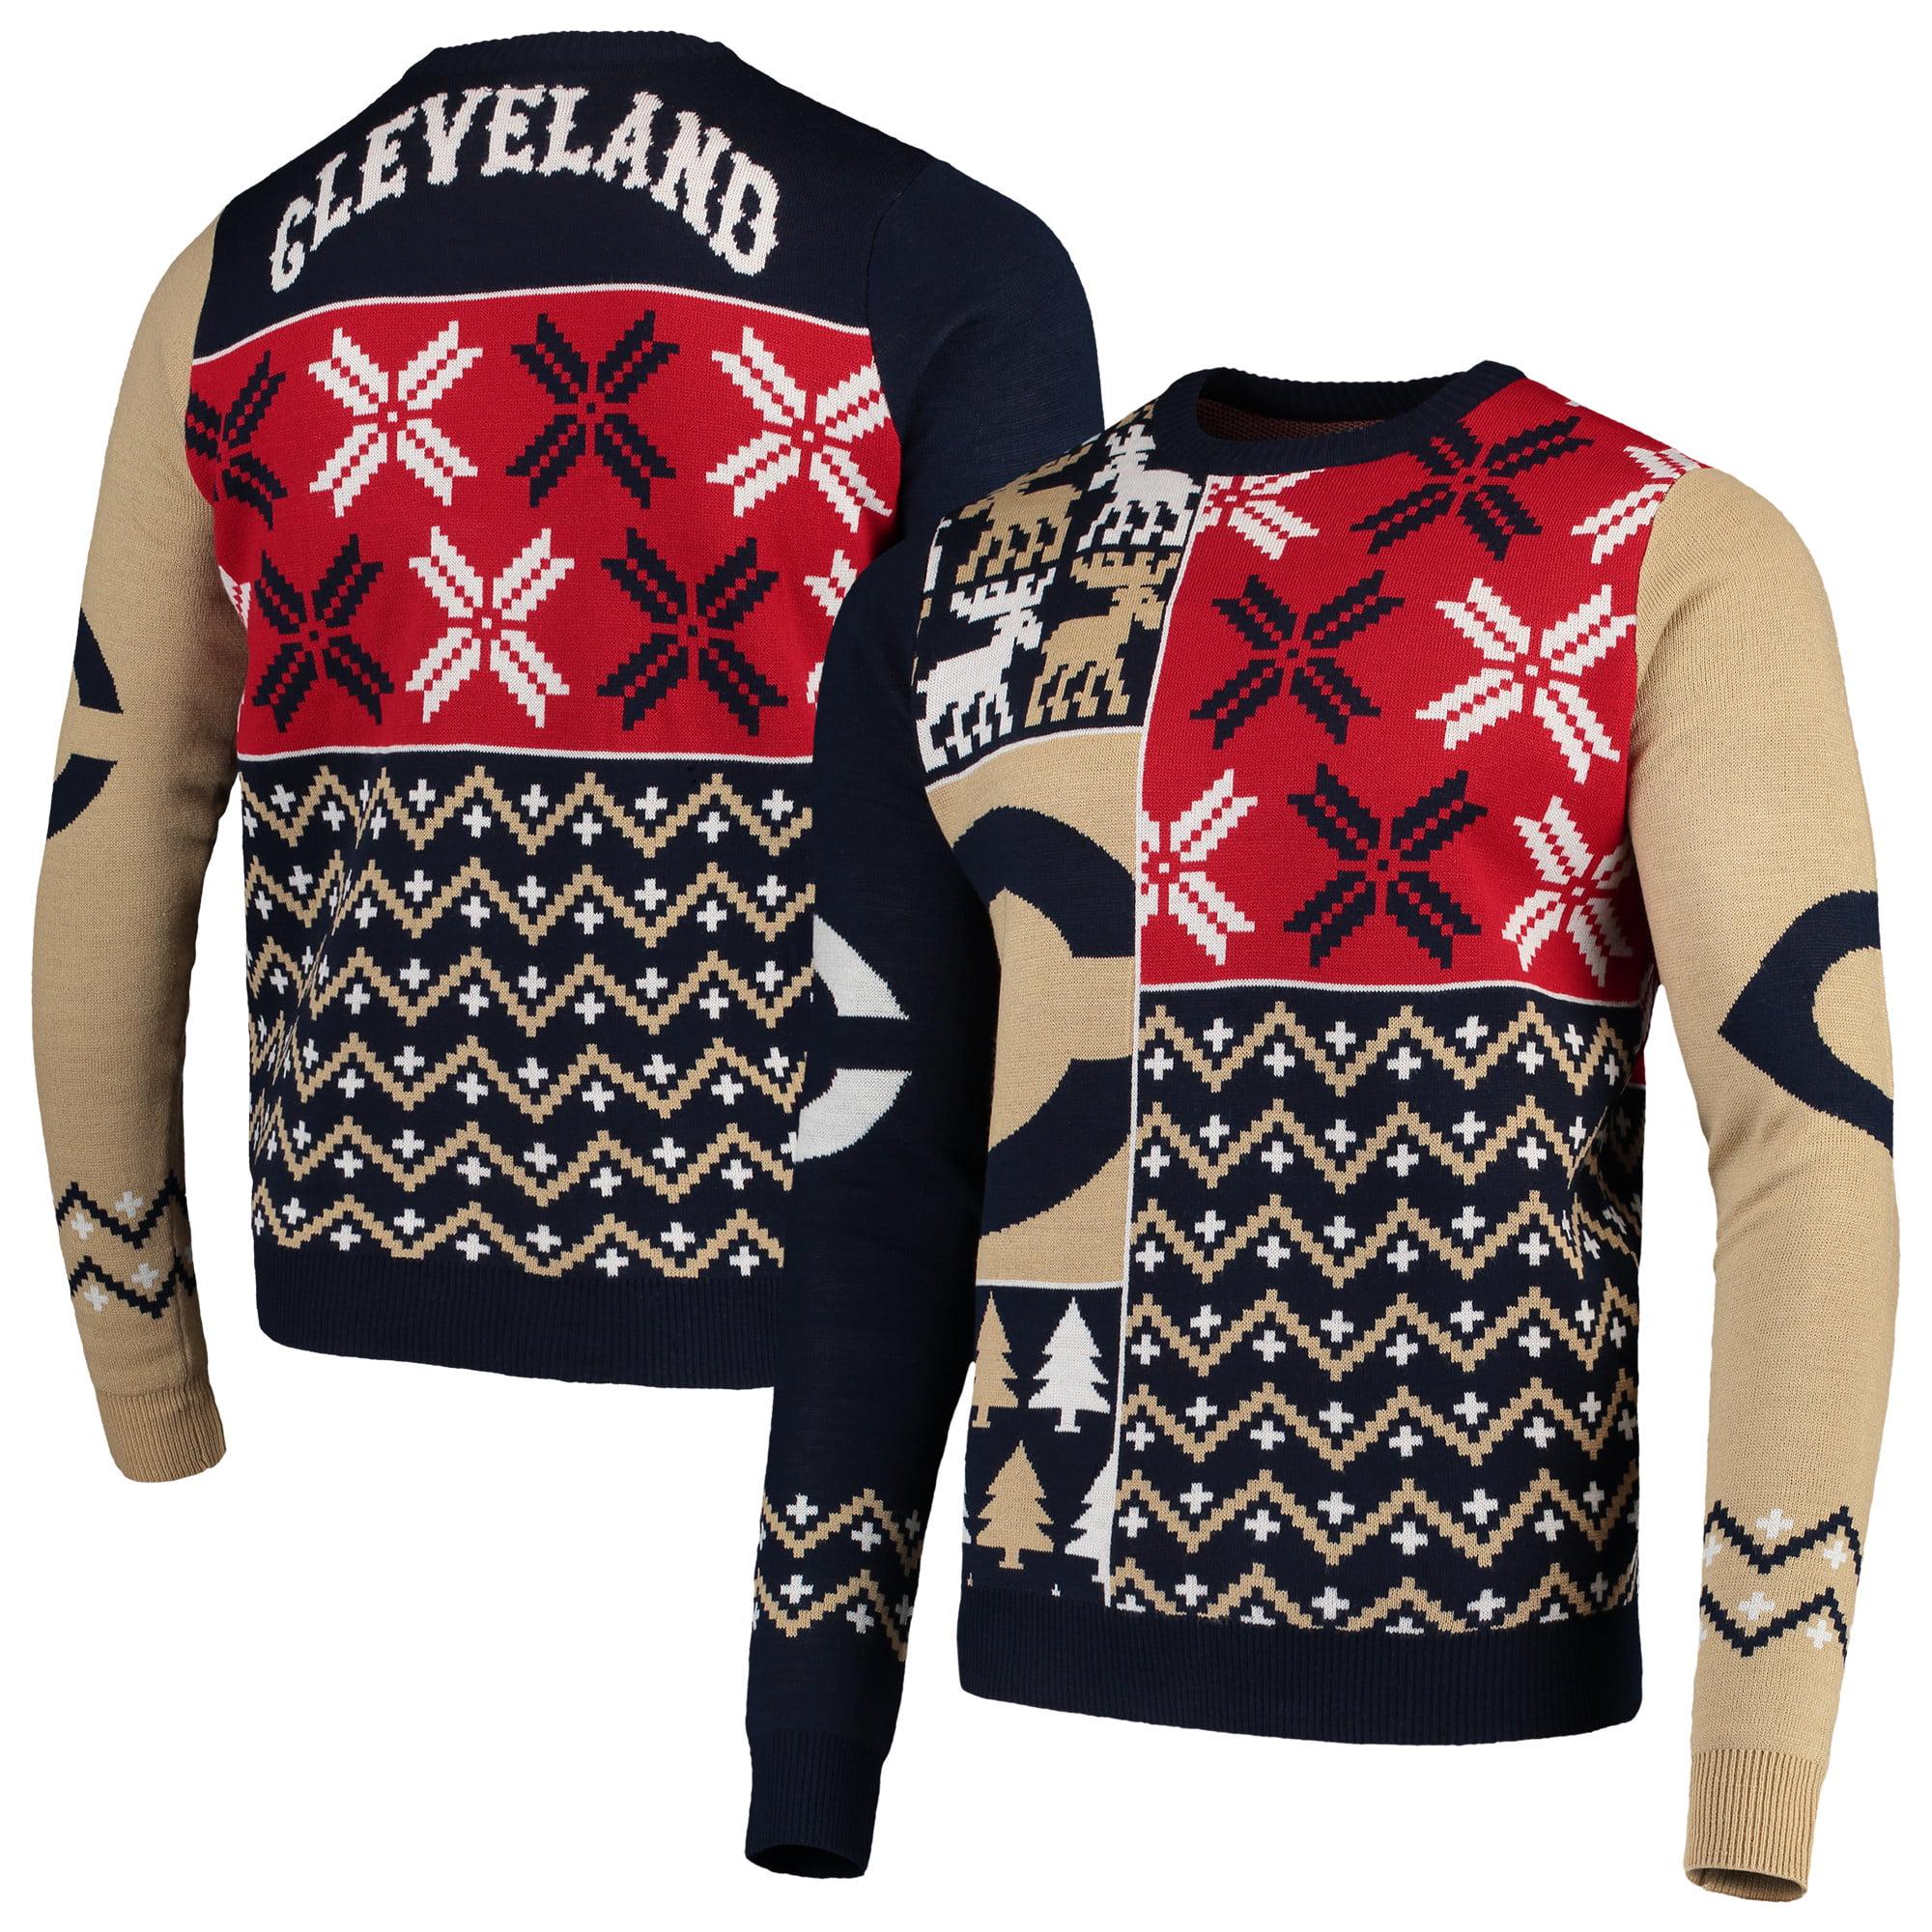 Cleveland Indians Retro Sweater - Navy